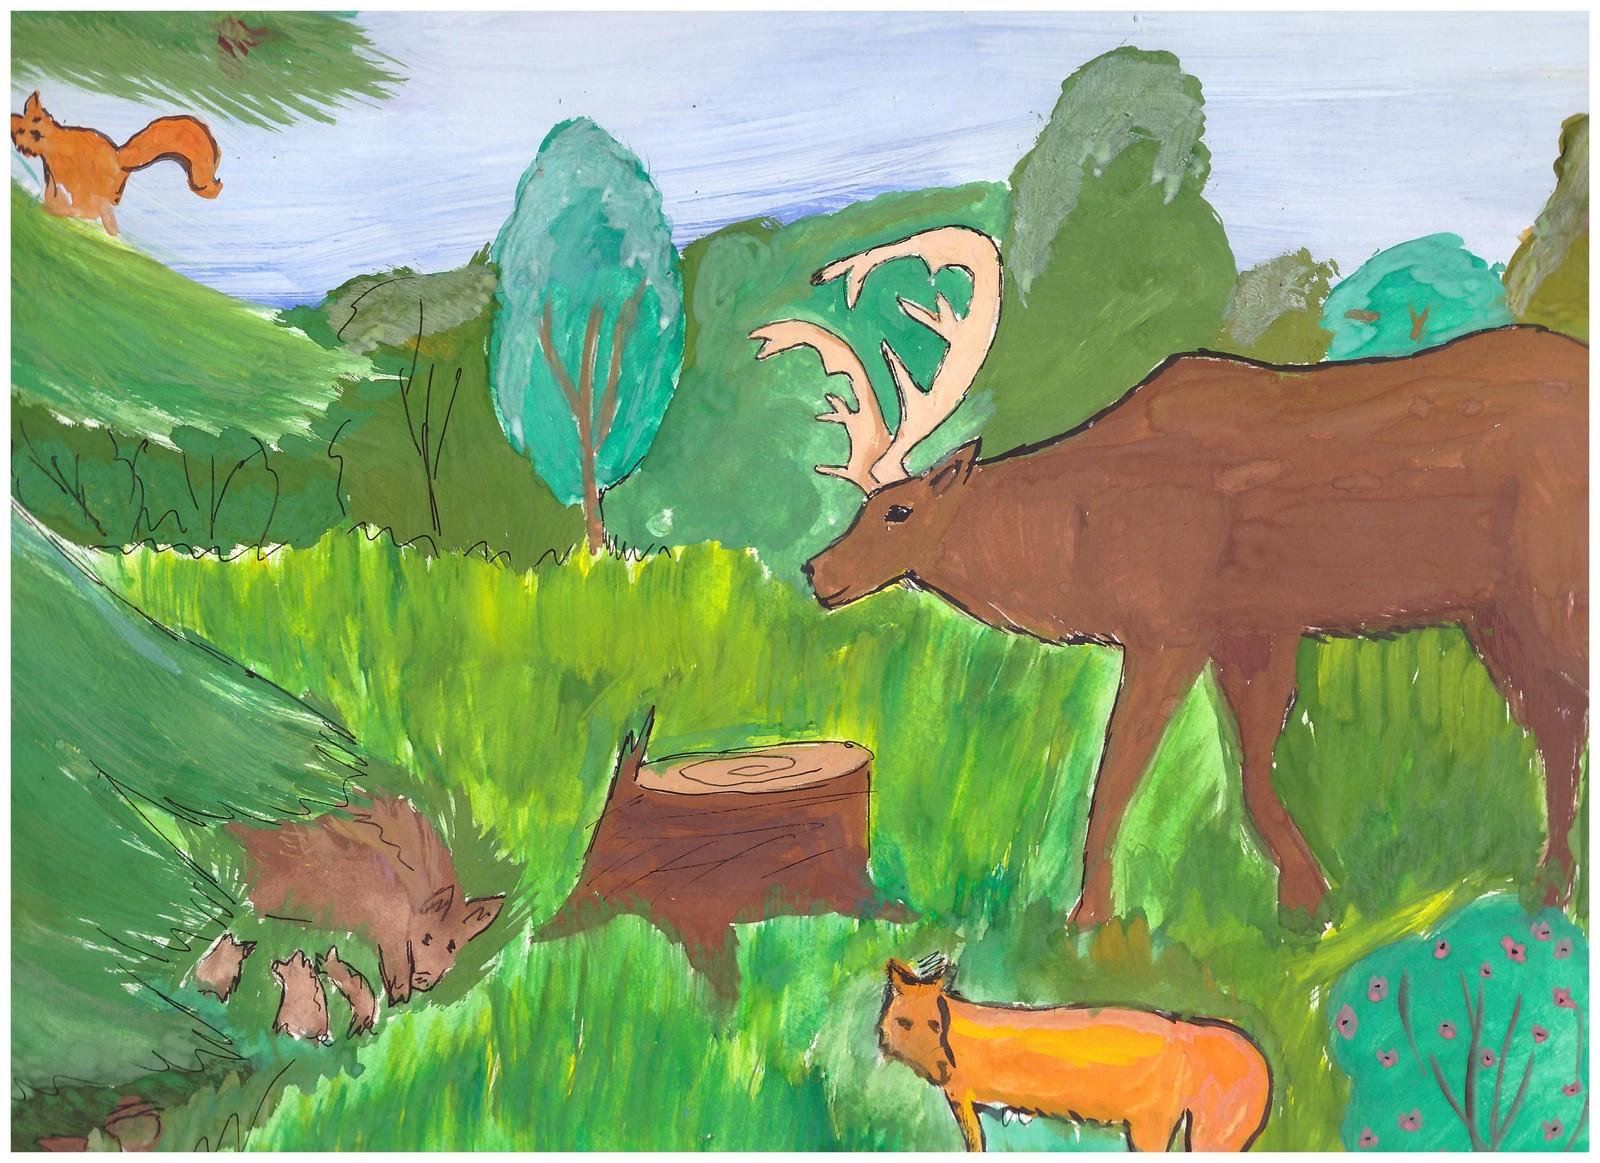 нарисовать рисунок про природу родного края самом